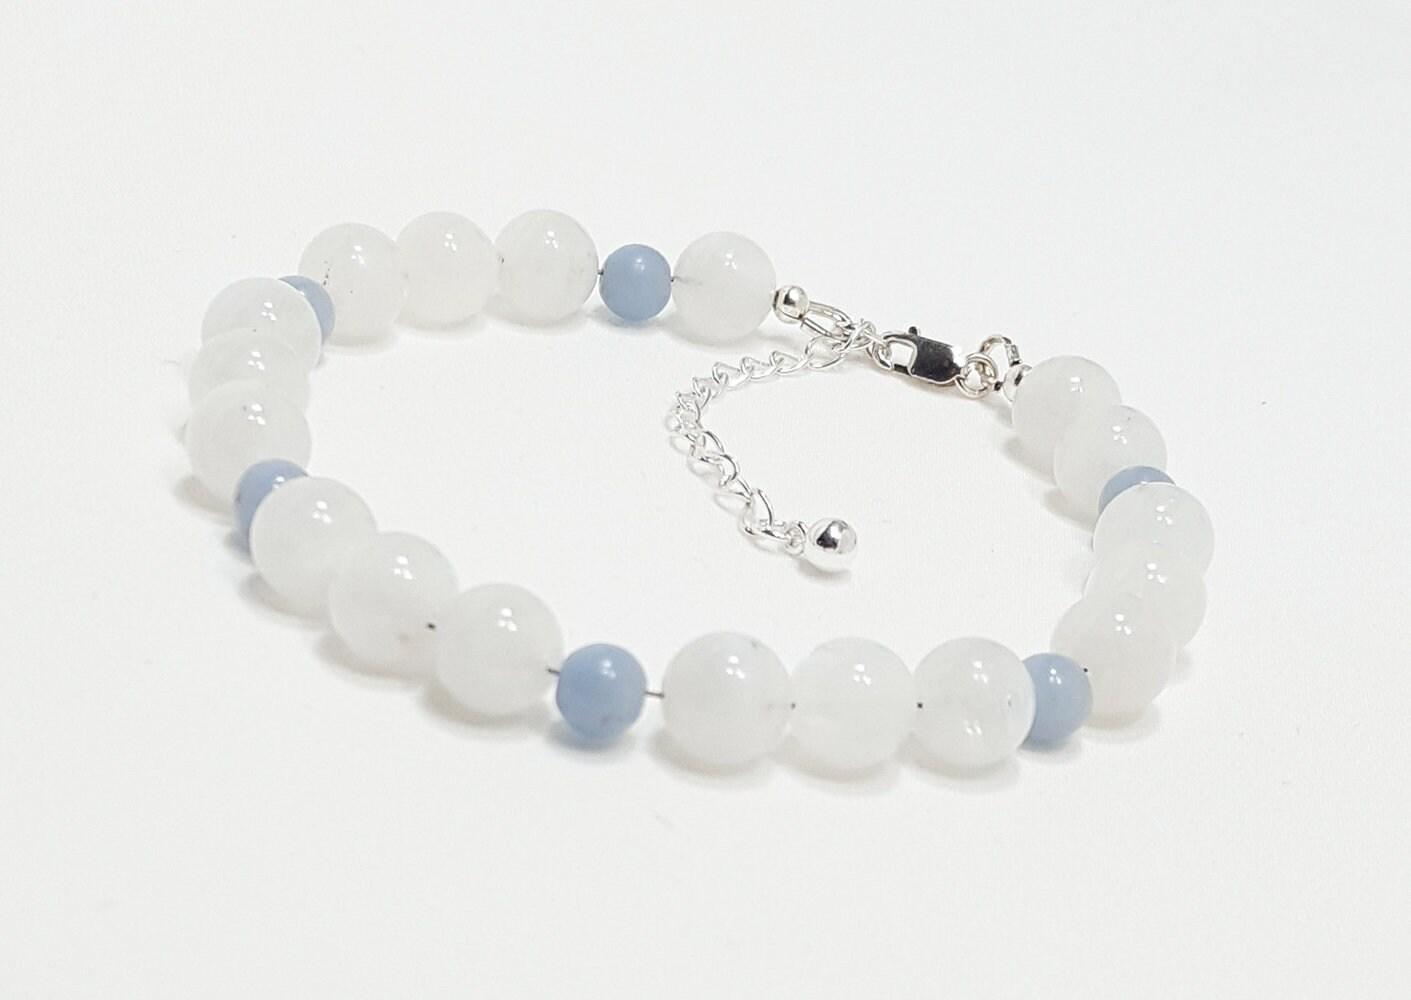 443a2ffb6c26a4 Good Energy Vibes® - Peace + Harmony Bracelet - Blue Lace Agate & Snow  Quartz Gemstone Beads, Energy Healing Yoga Meditation Chakra Stones